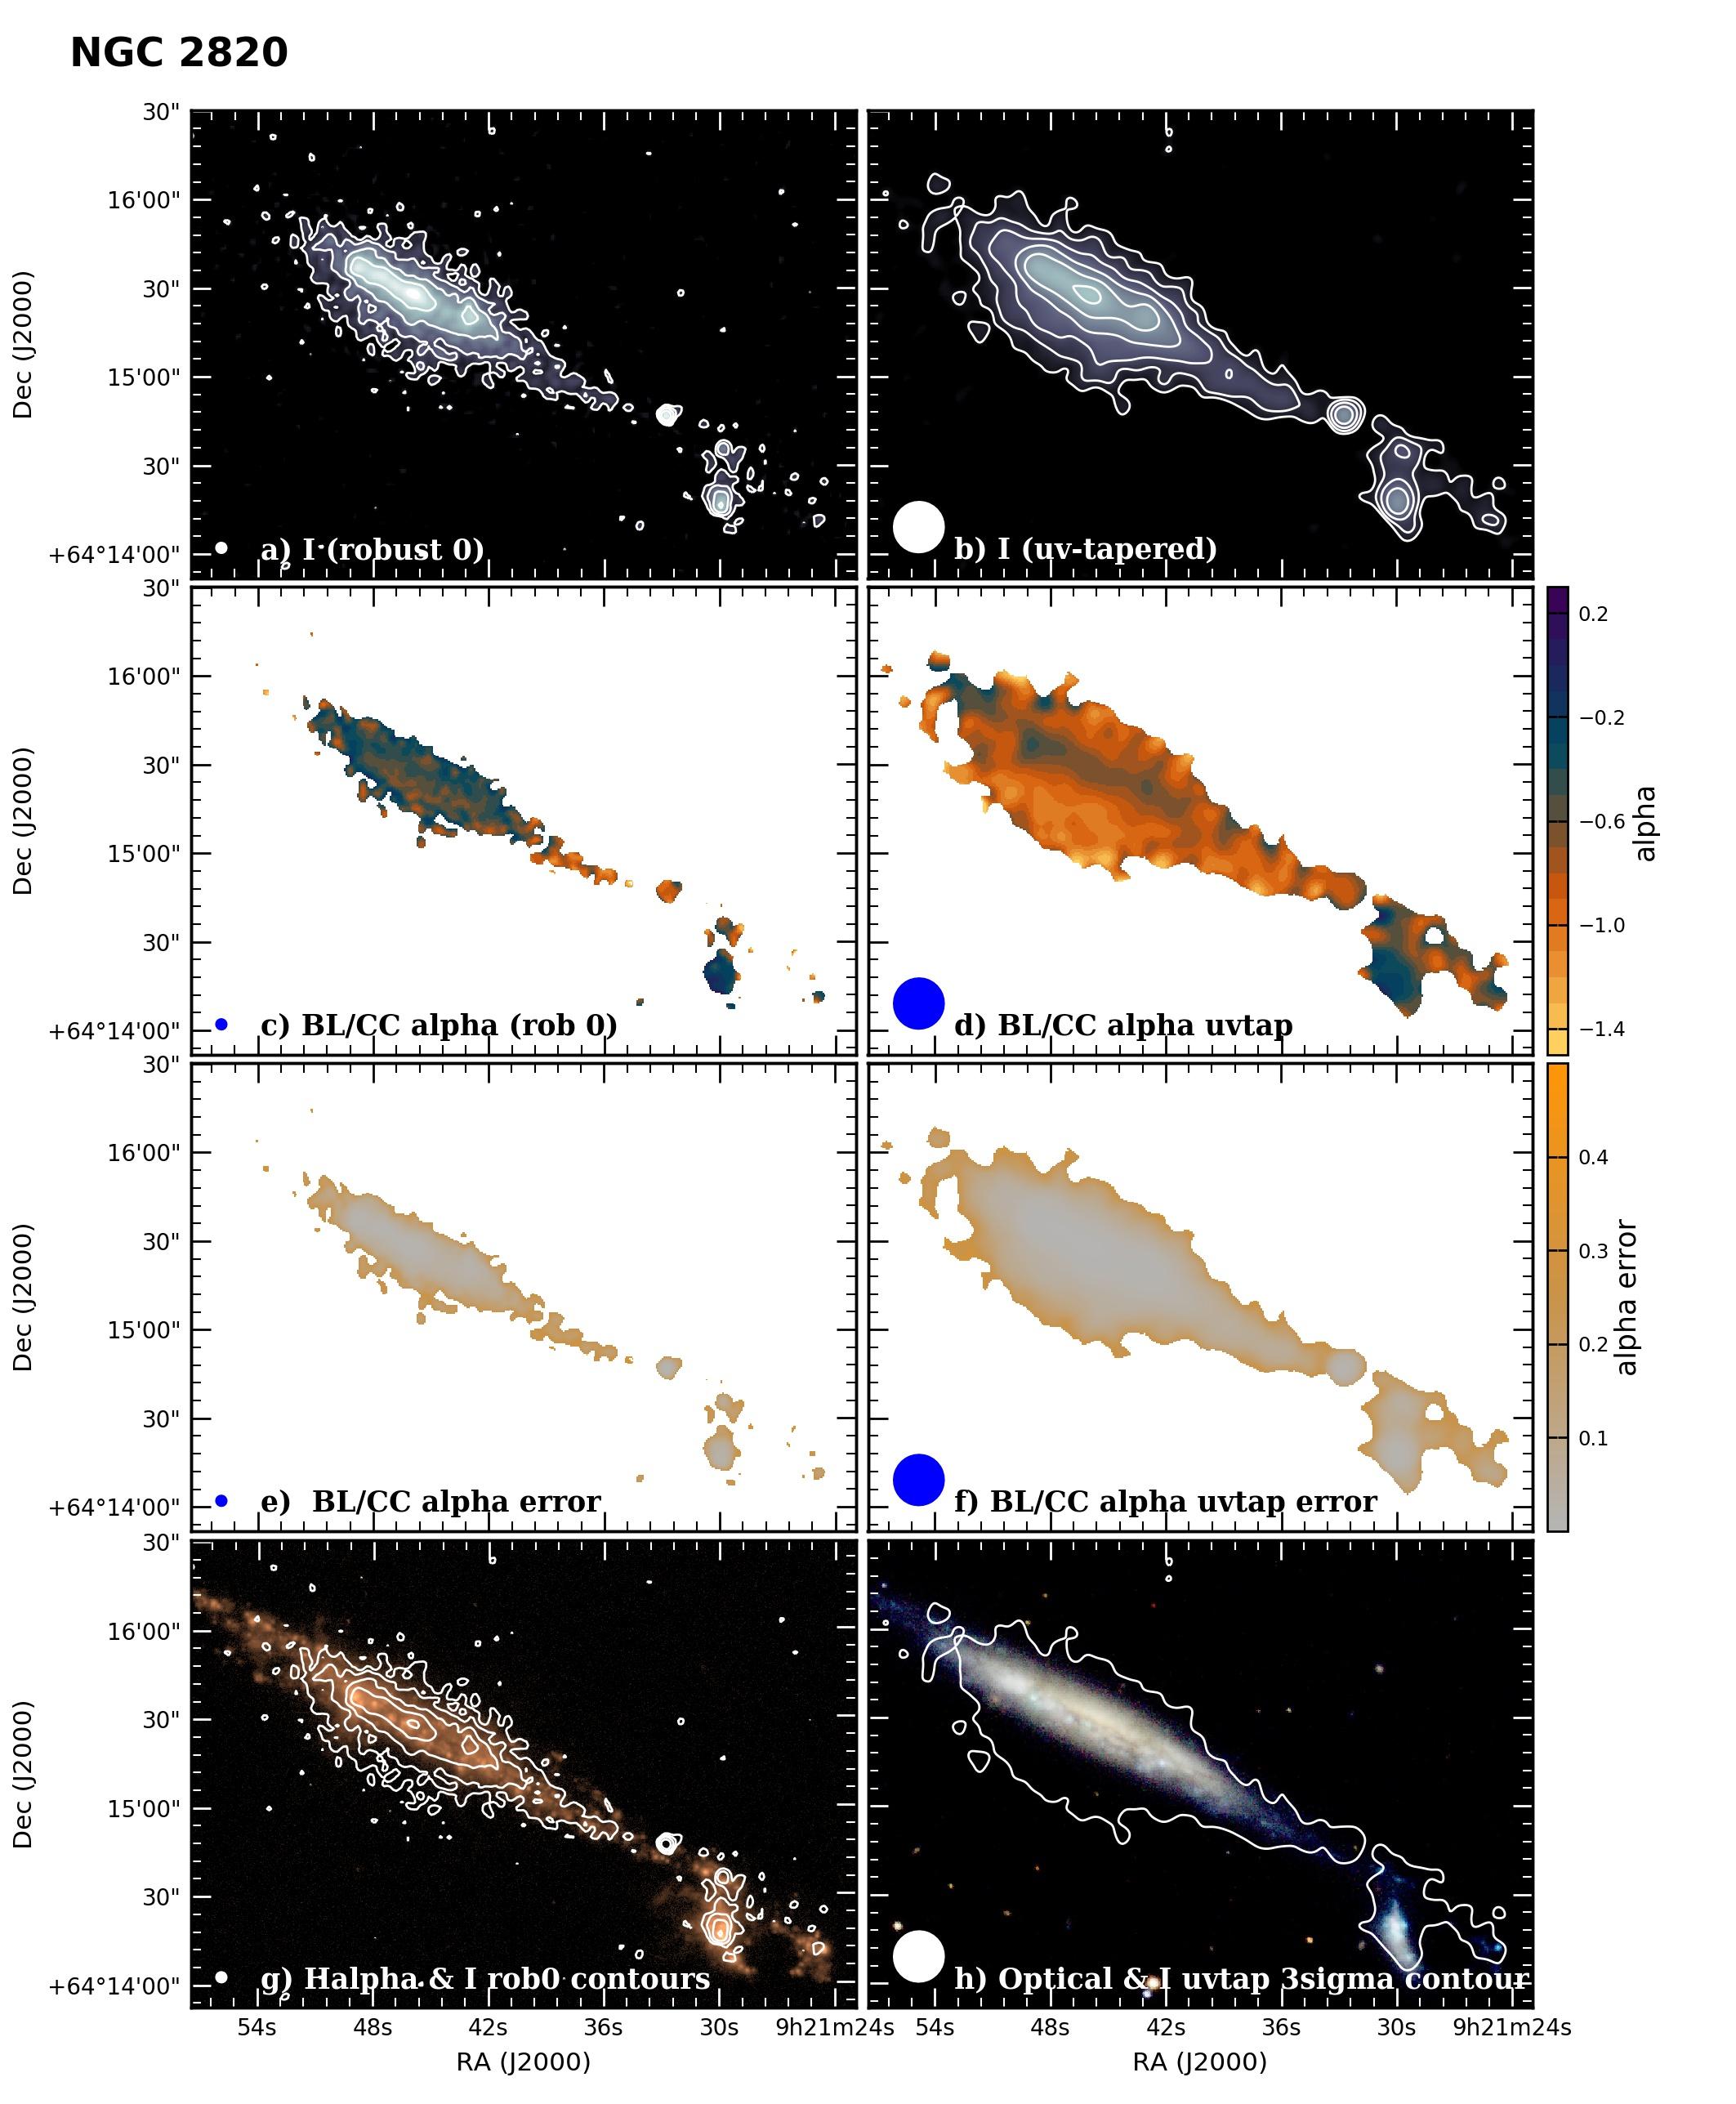 Panel image of NGC2820 from B configuration data release III (Irwin et al. 2019)